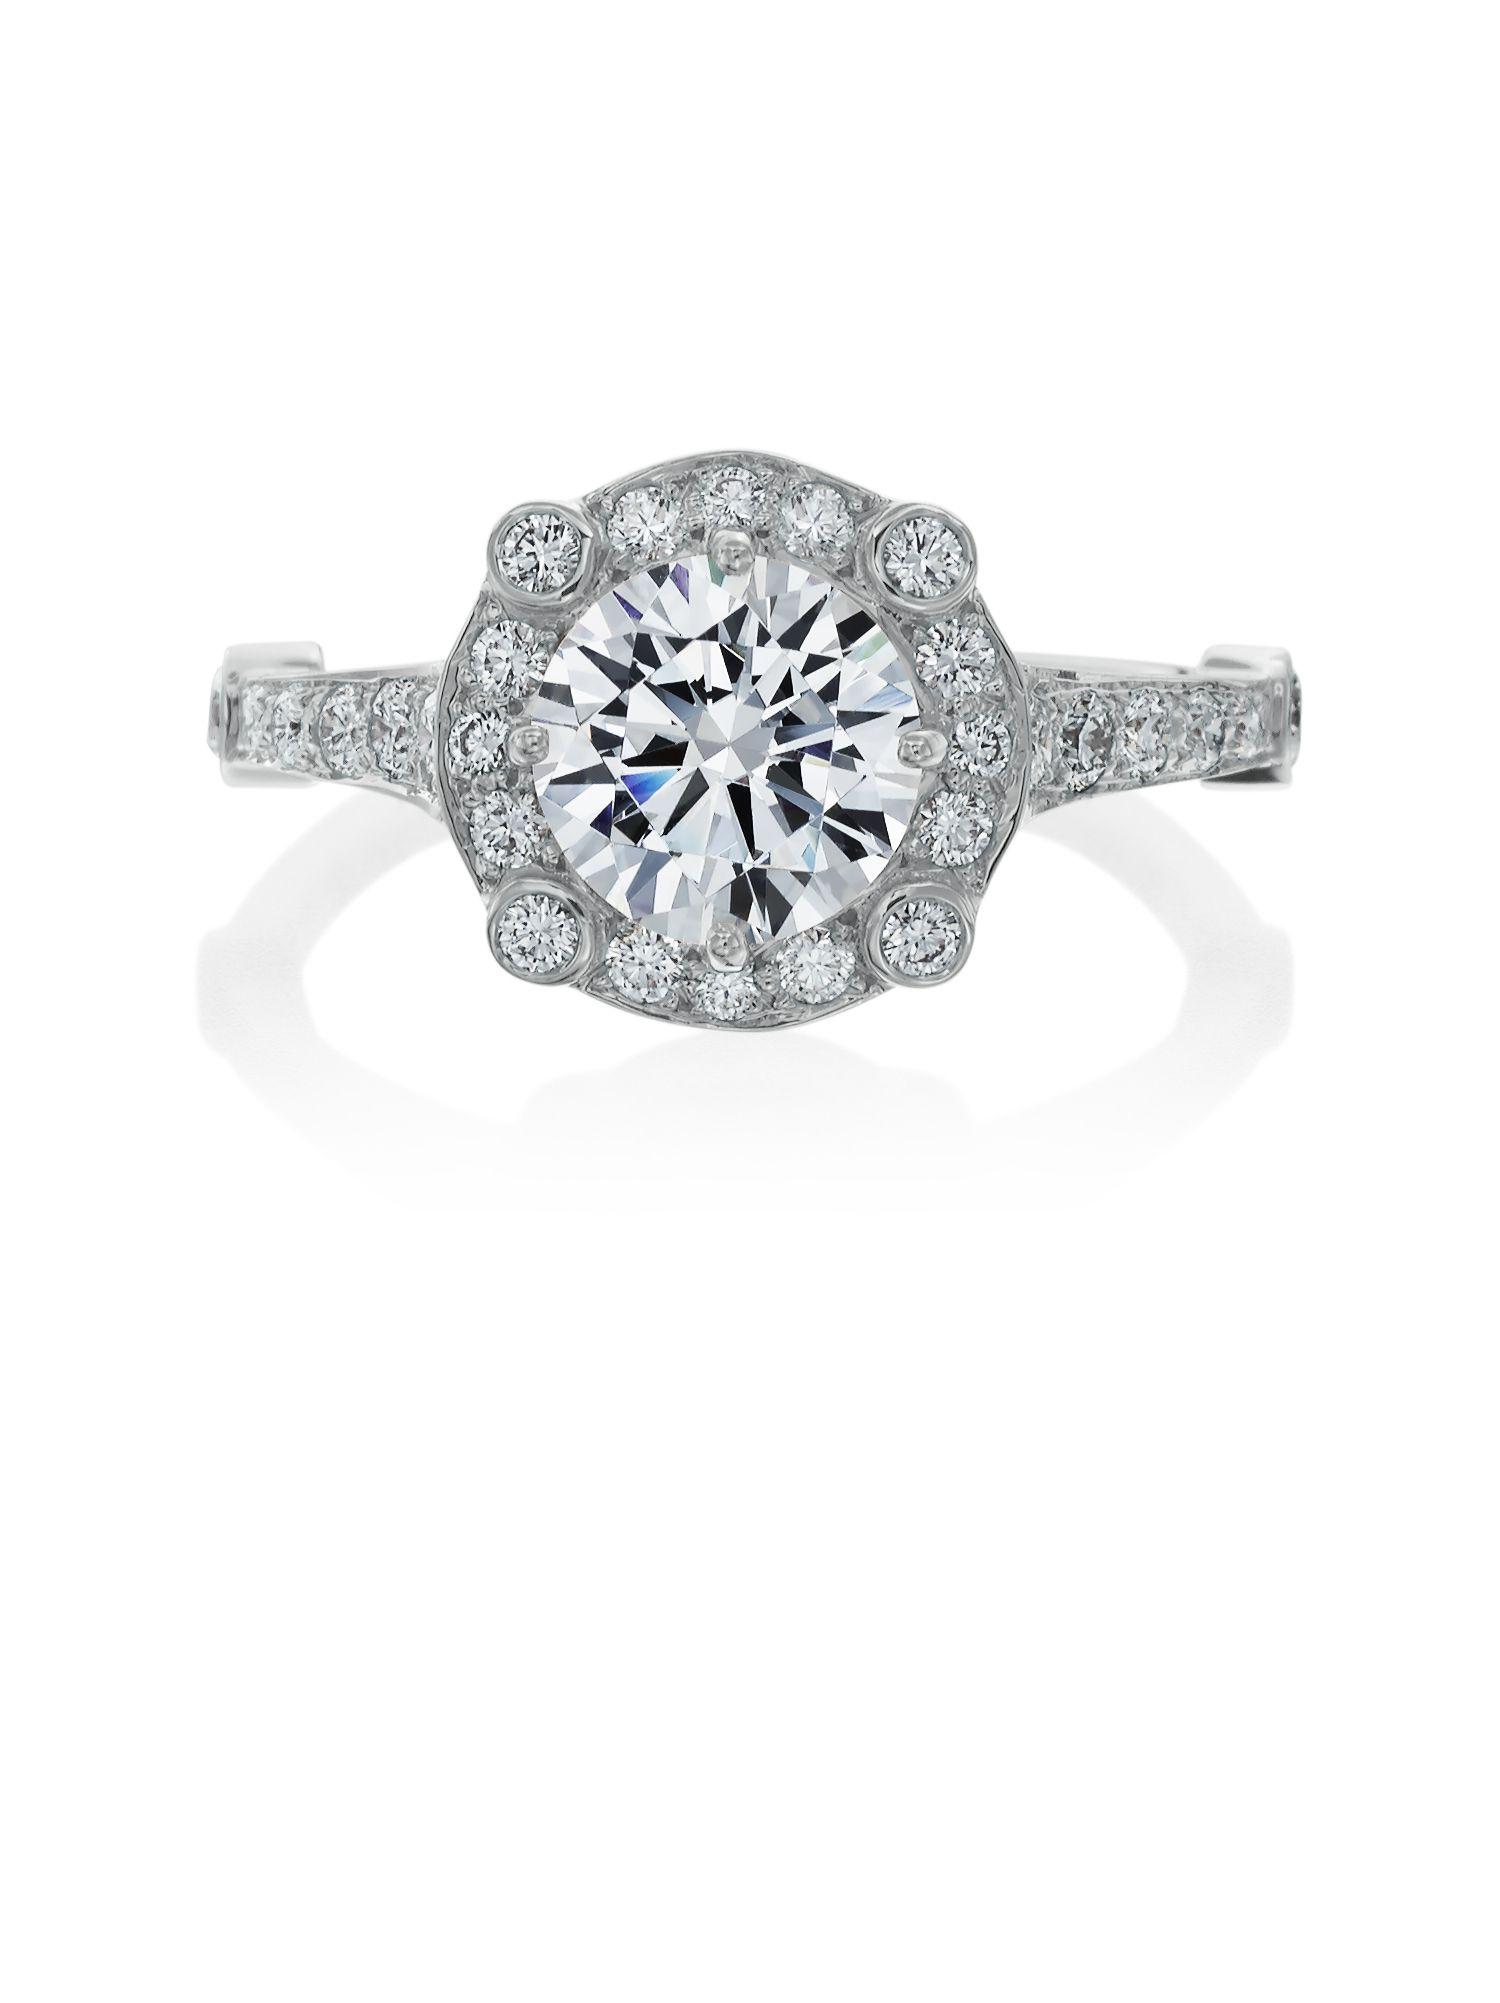 Beautiful halo platinum engagement ring. See more at